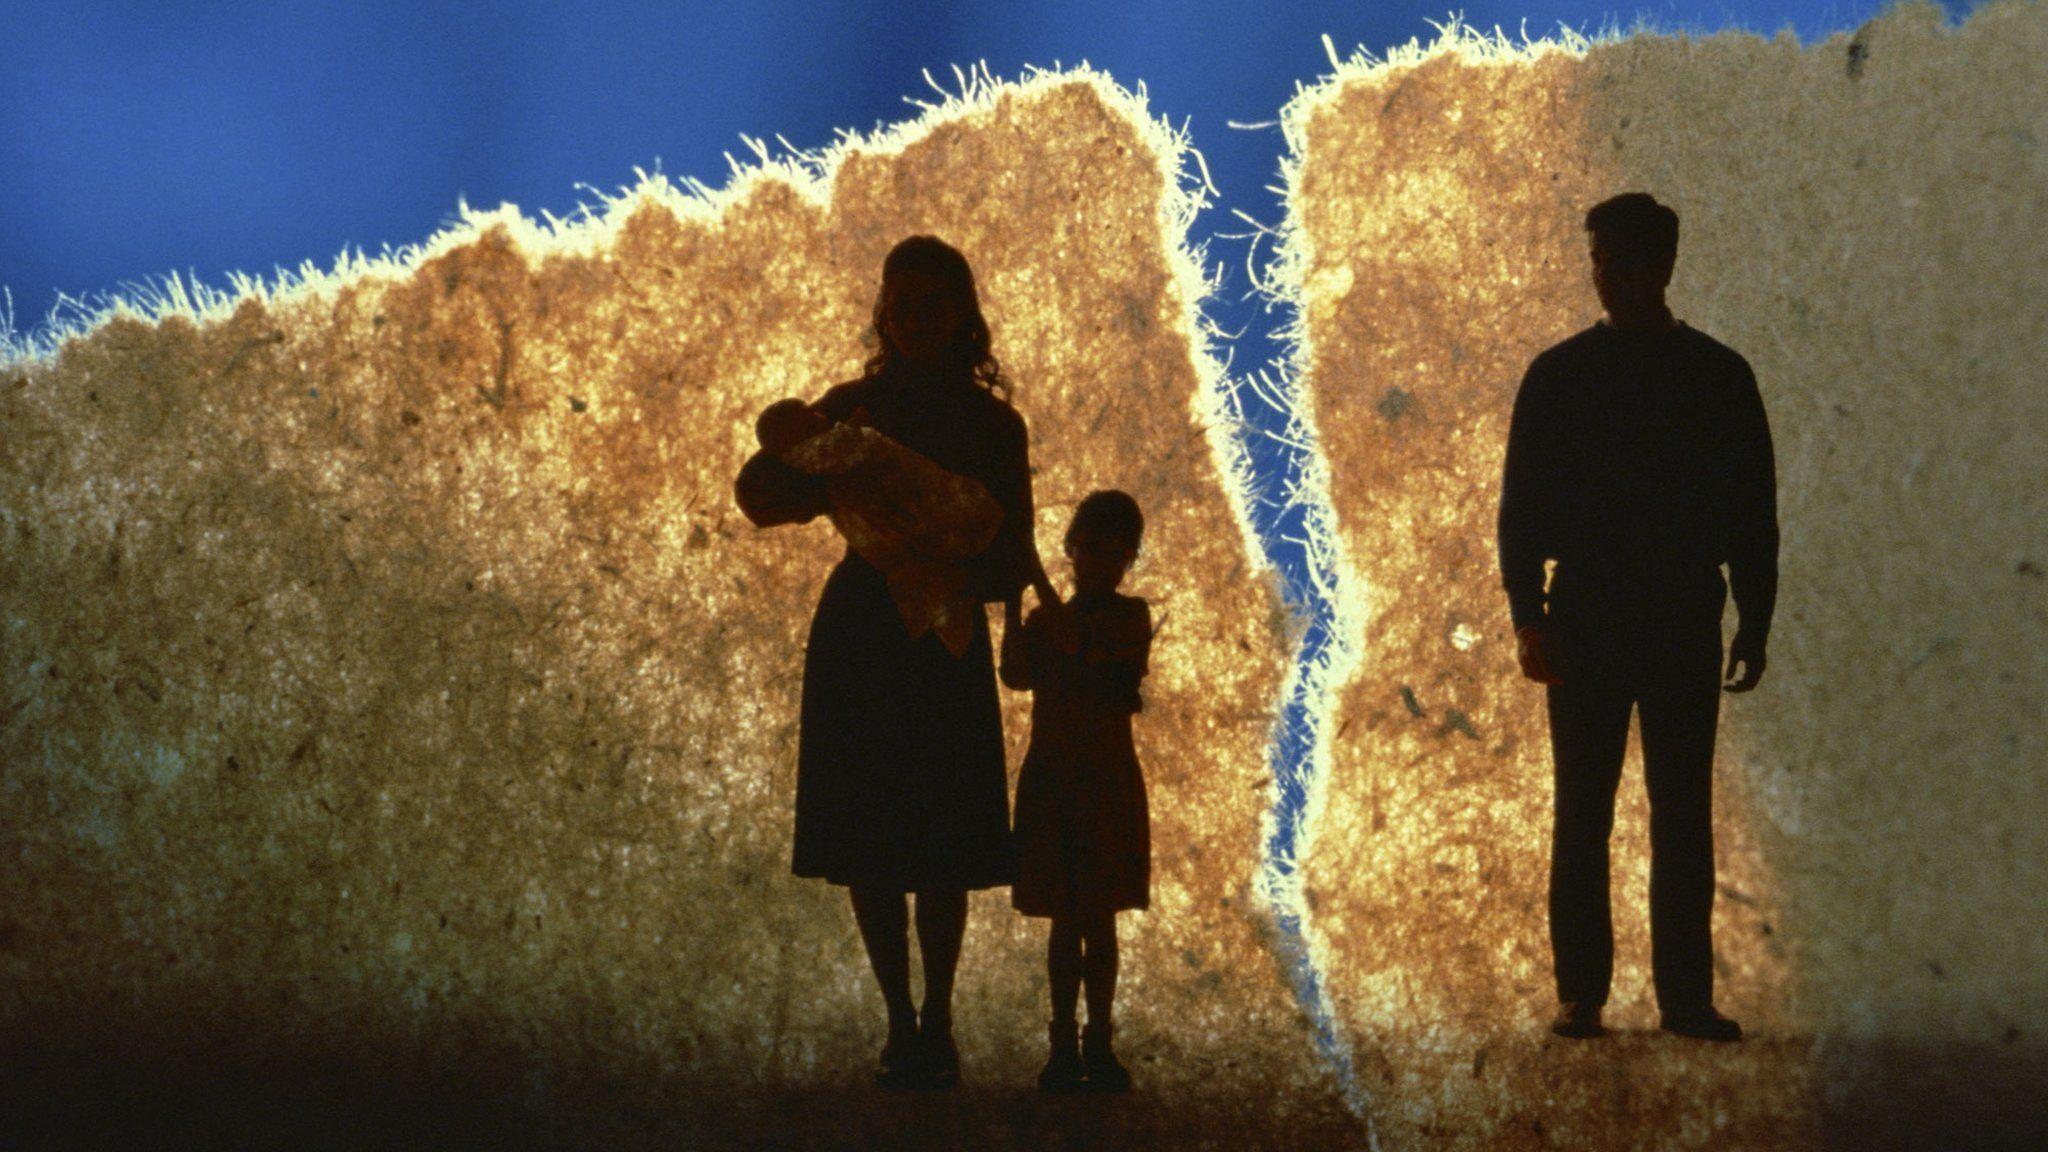 Silhouette of a split family